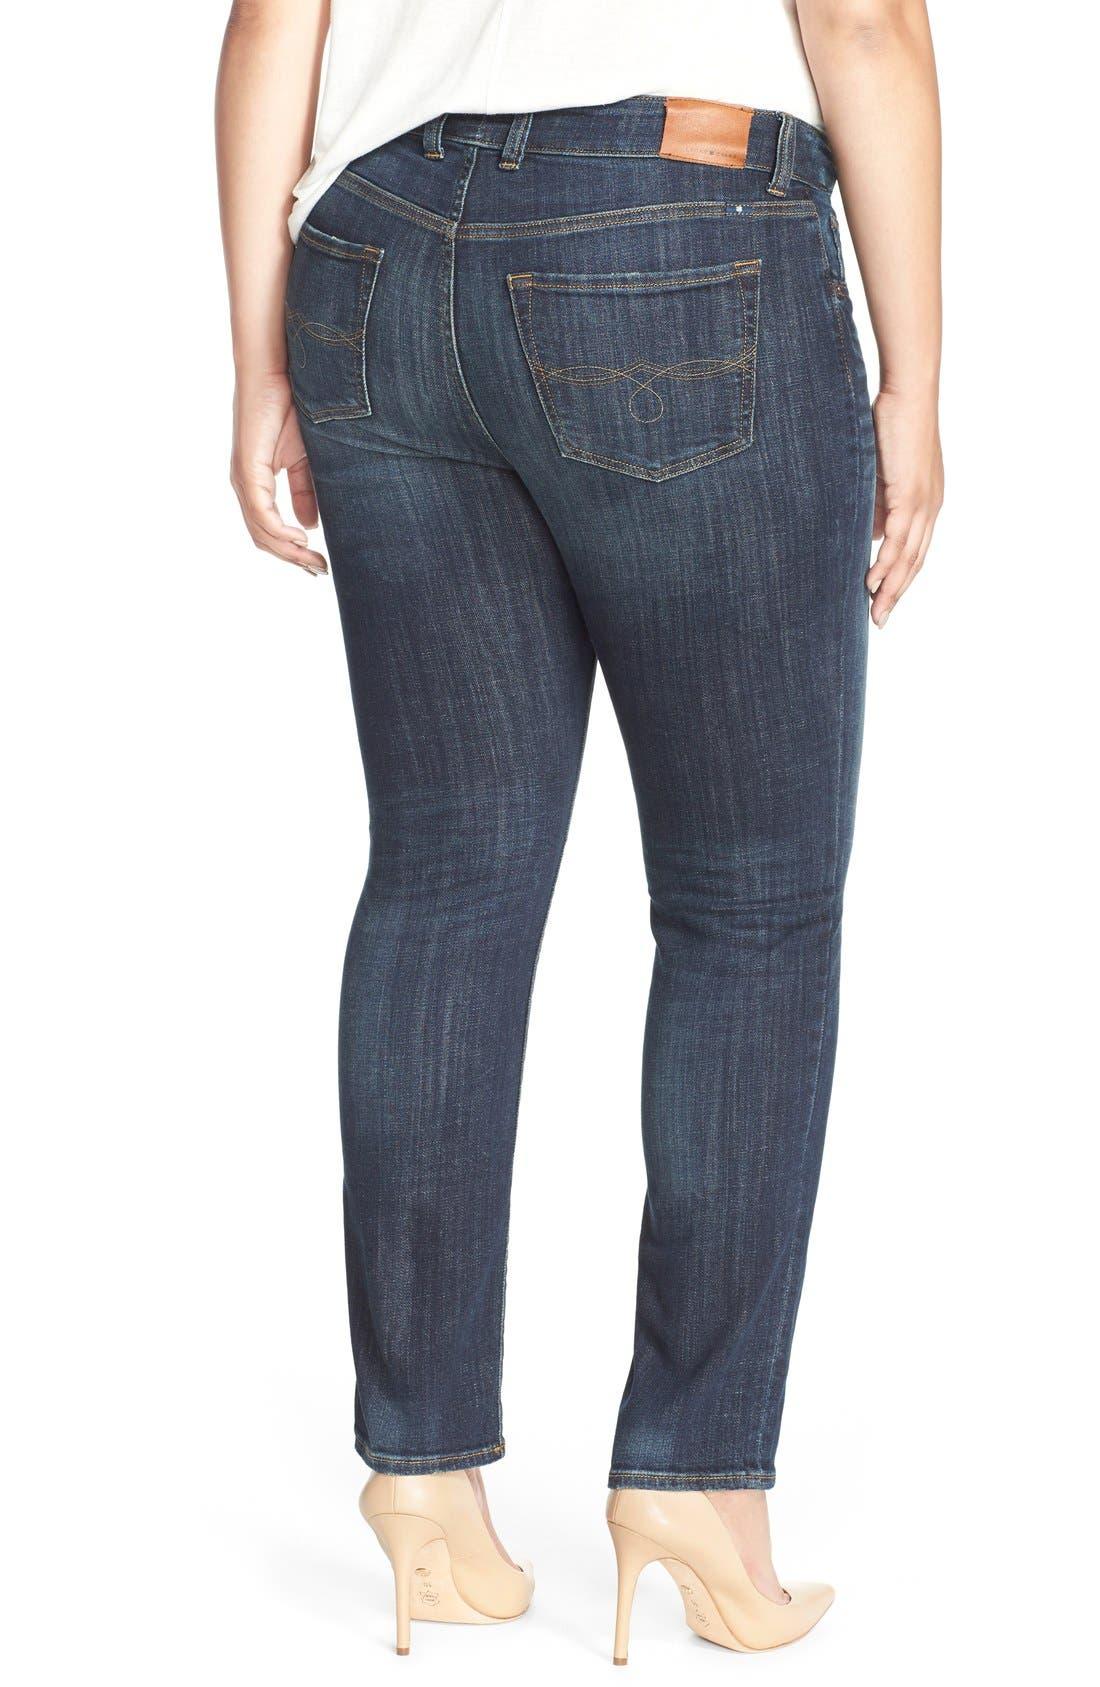 LUCKY BRAND, Emma High Rise Stretch Straight Leg Jeans, Alternate thumbnail 5, color, TIBURON